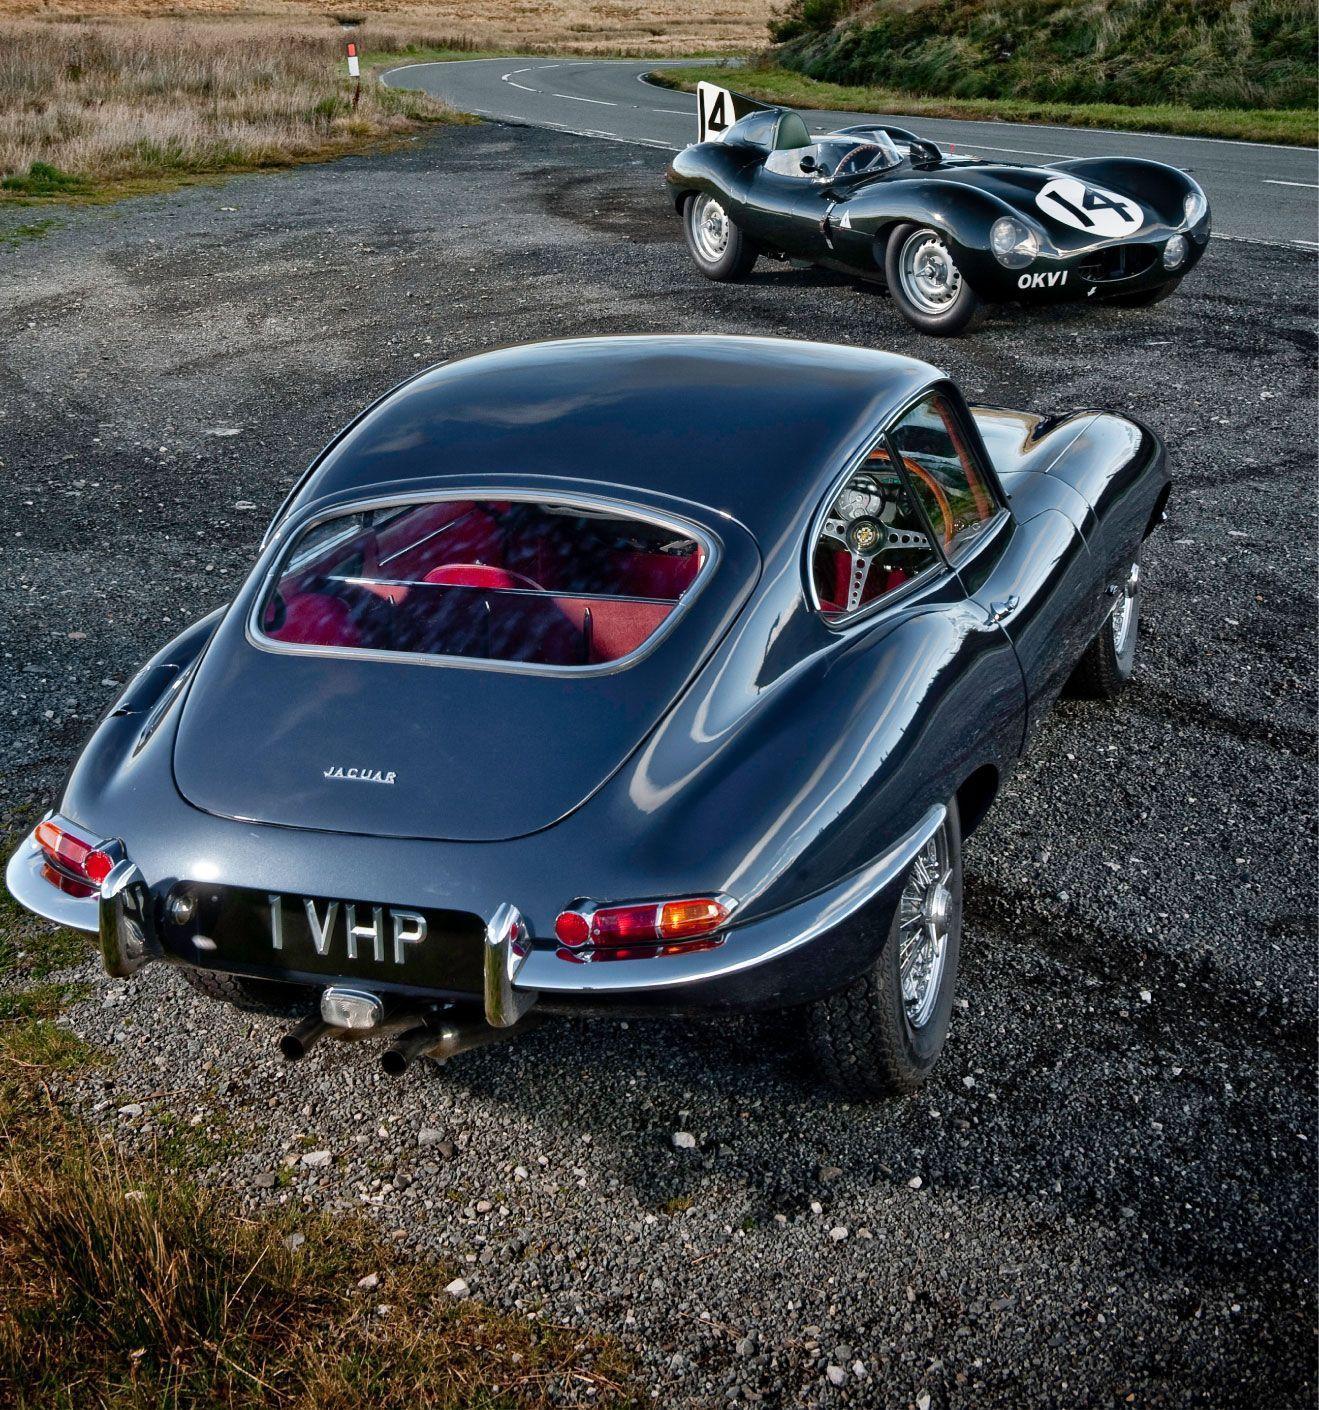 Www Classic Motor Cars Co Uk Images Site Tmp Hero 4 Jpg Jaguarvintagecars Sports Cars Bugatti Classic Cars Bugatti Cars